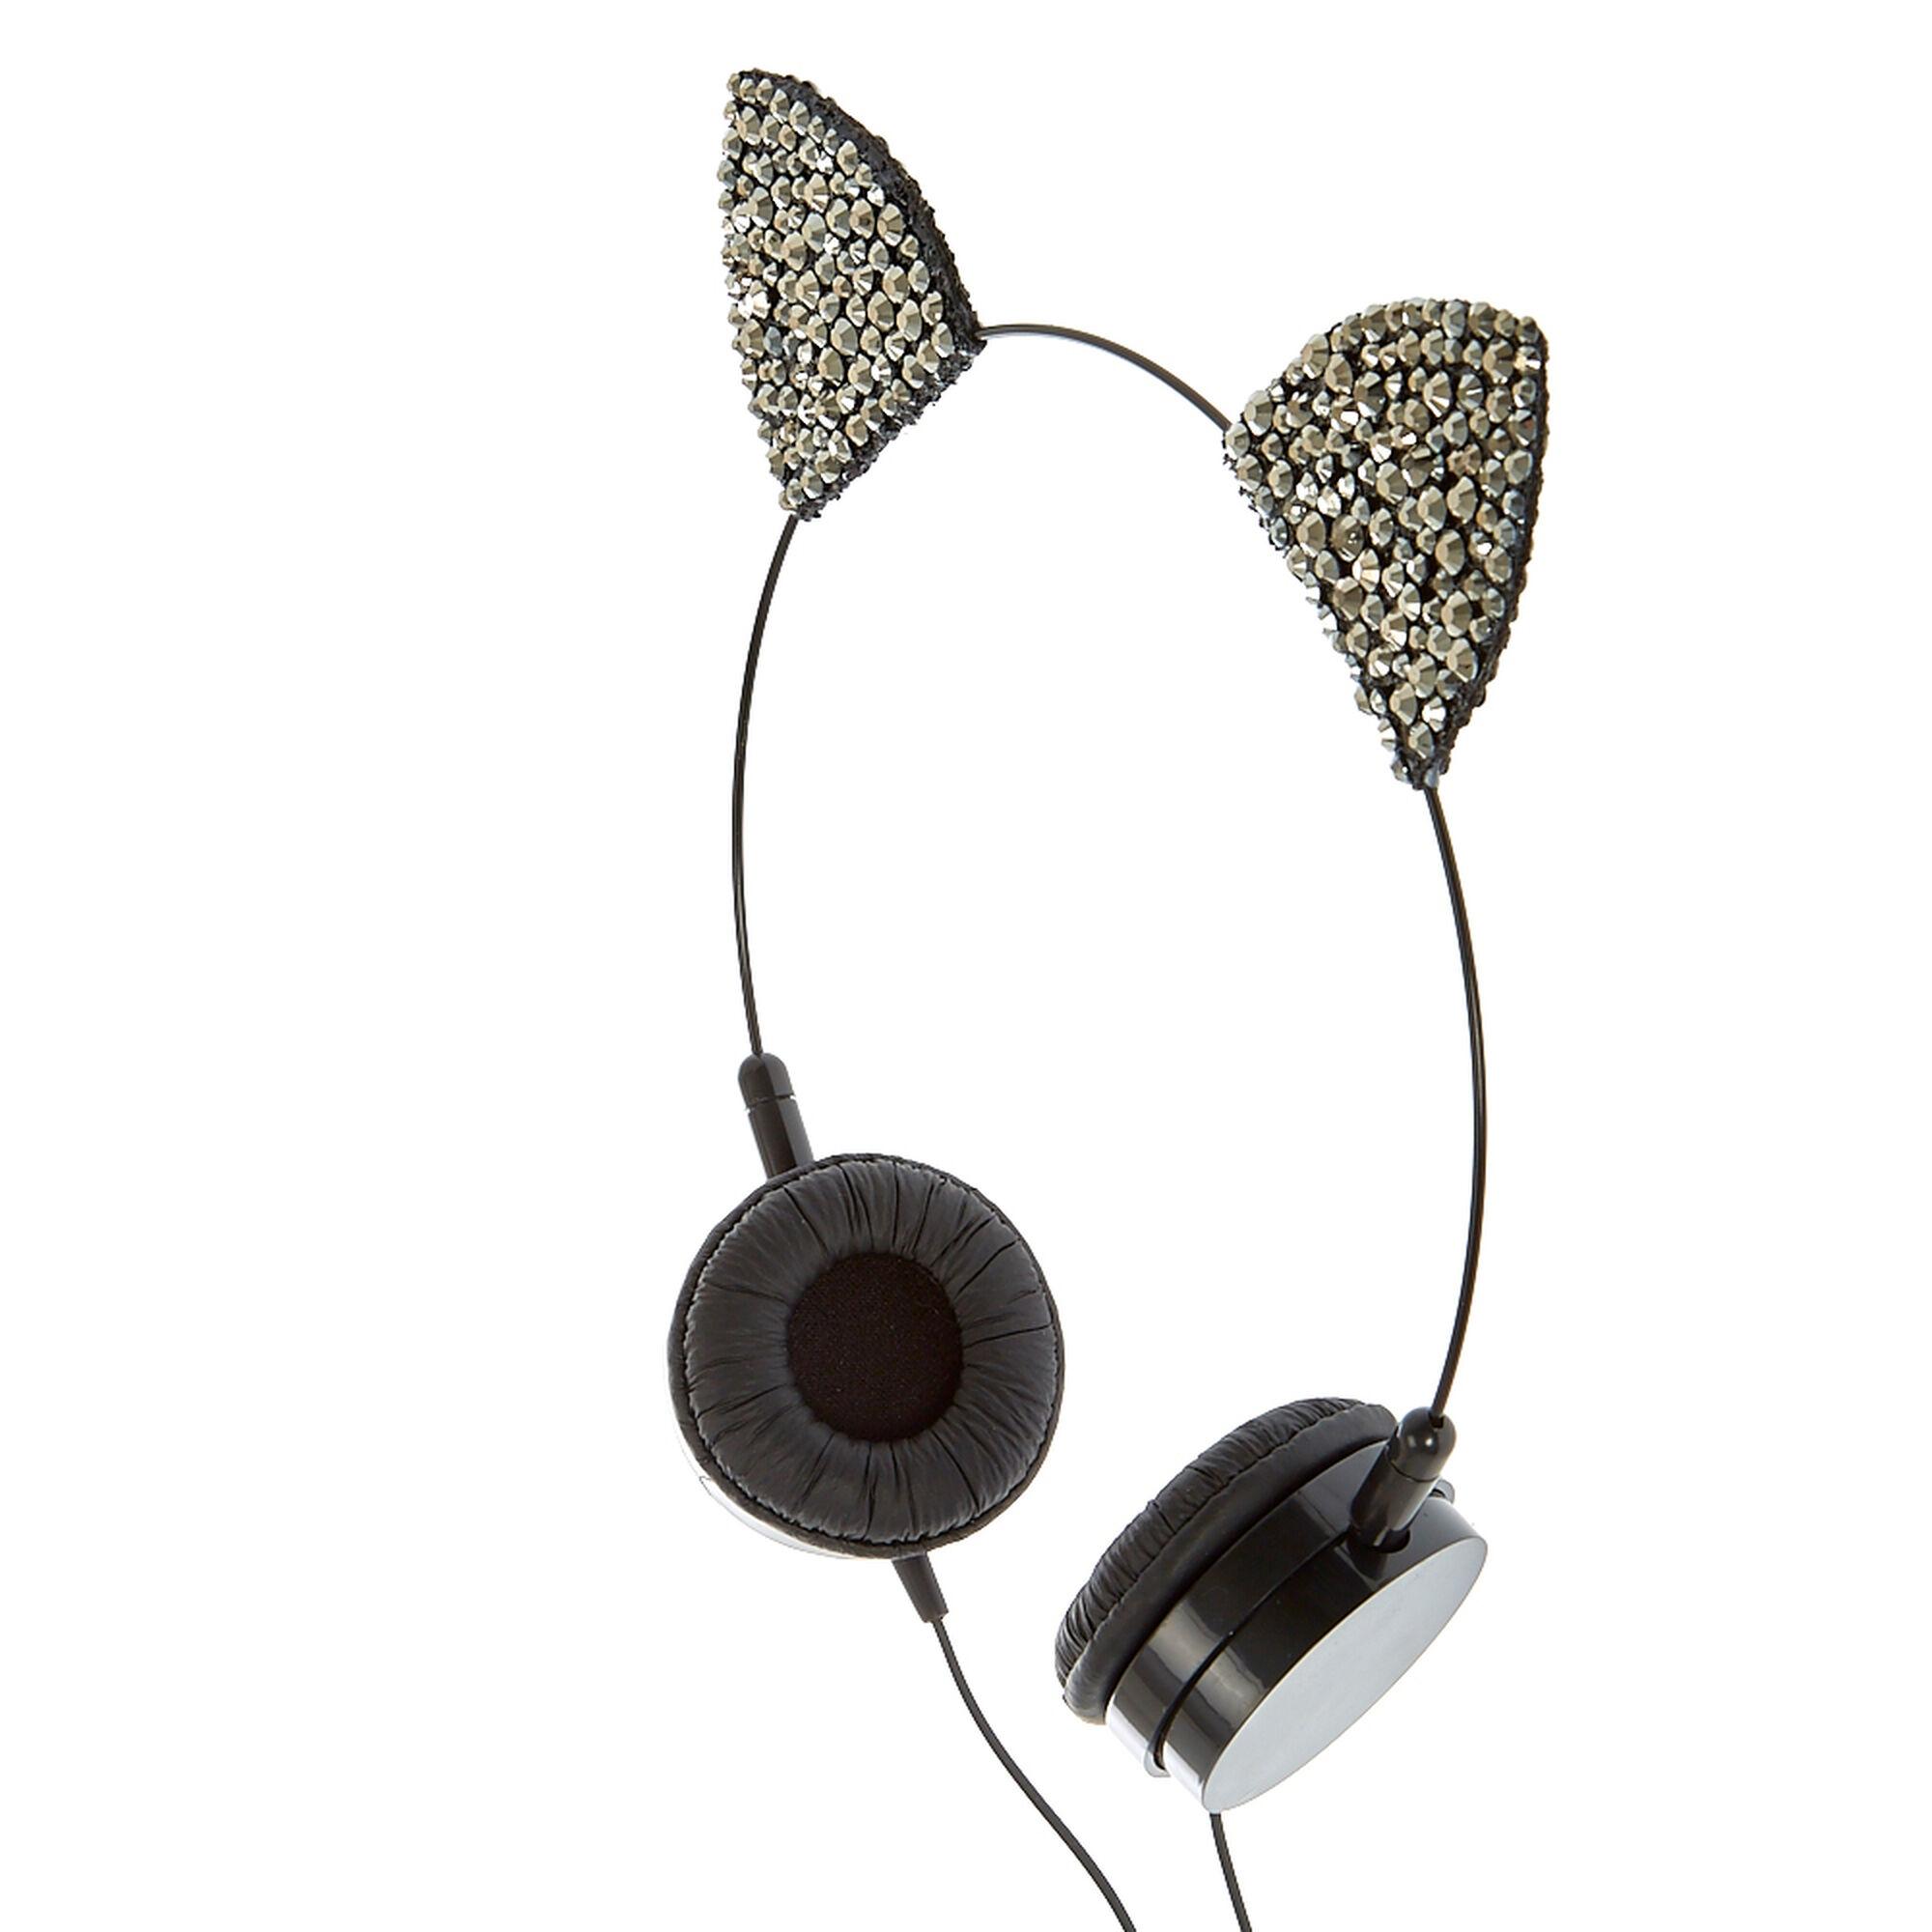 6b9ada5df0c Hematite Cat Ear Headphones | Claire's